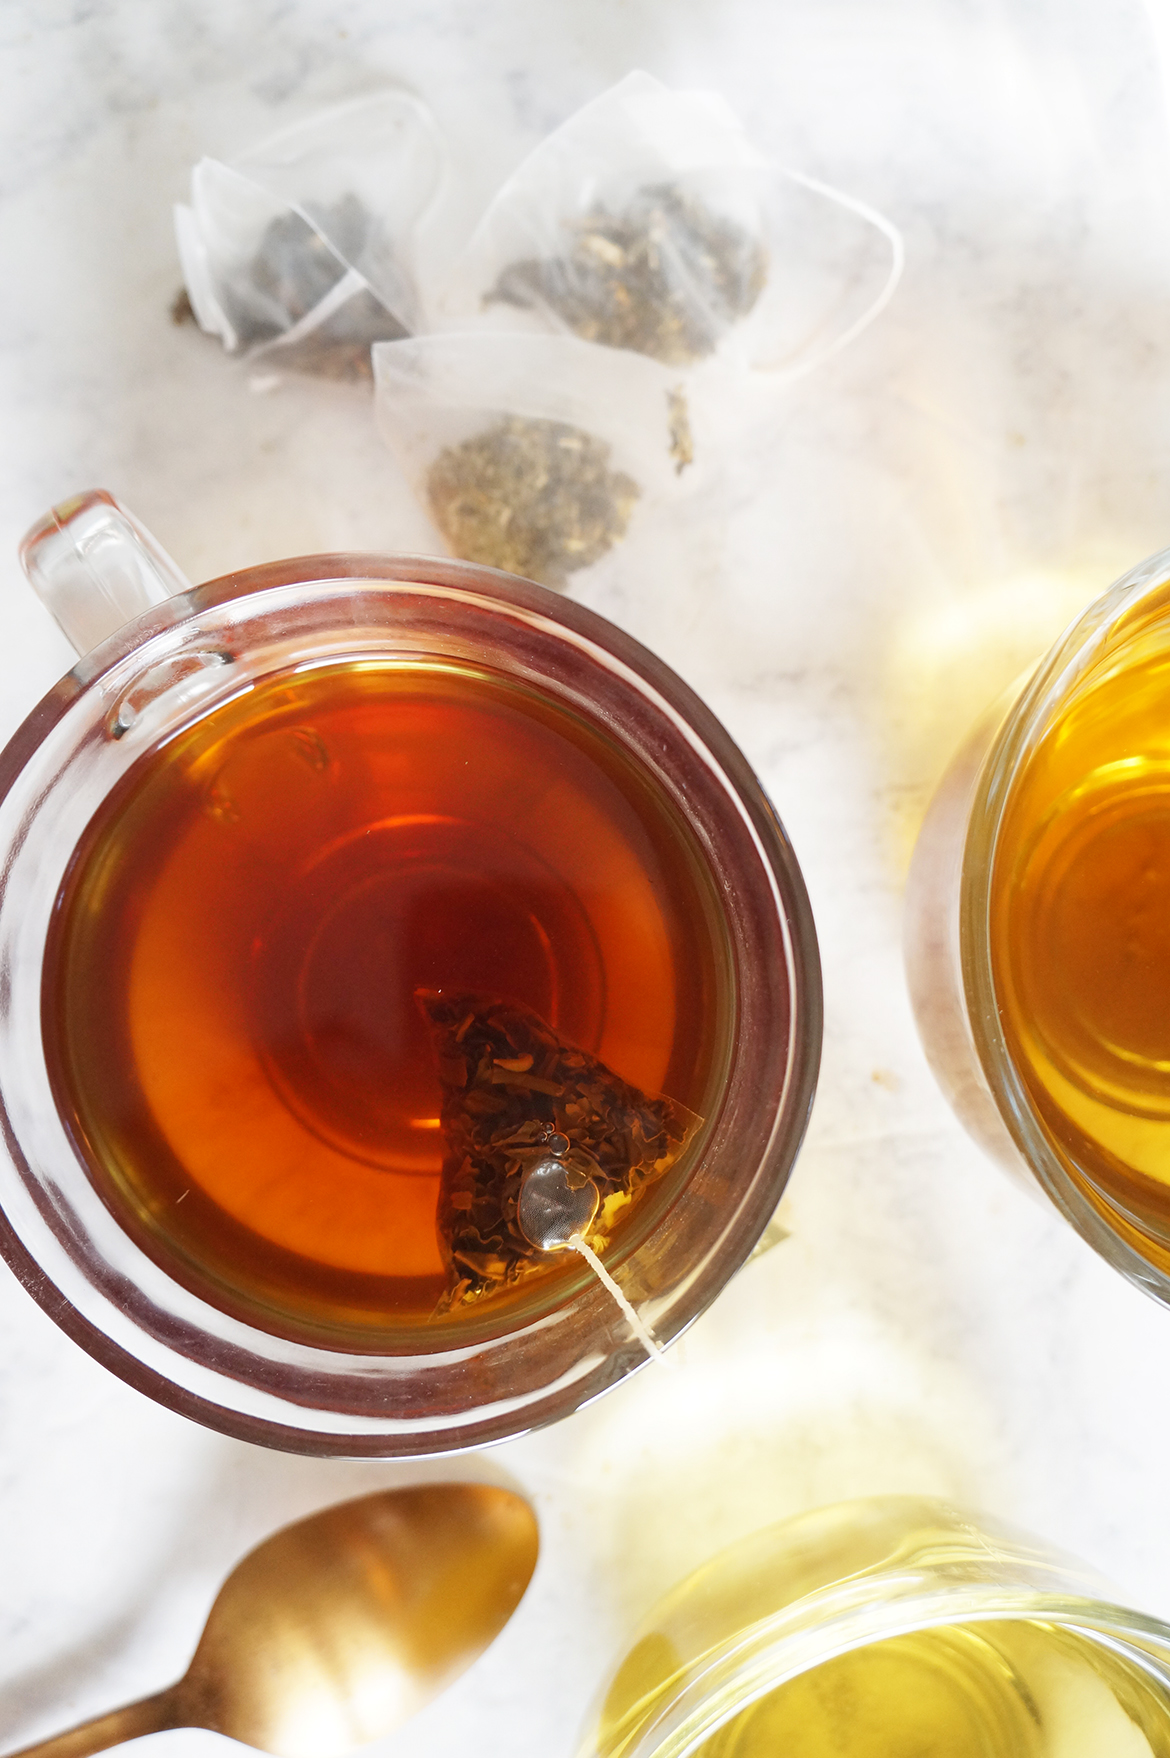 Andrea Fenise Memphis Fashion Blogger and Memphis Food Blogger shares health benefits of tea